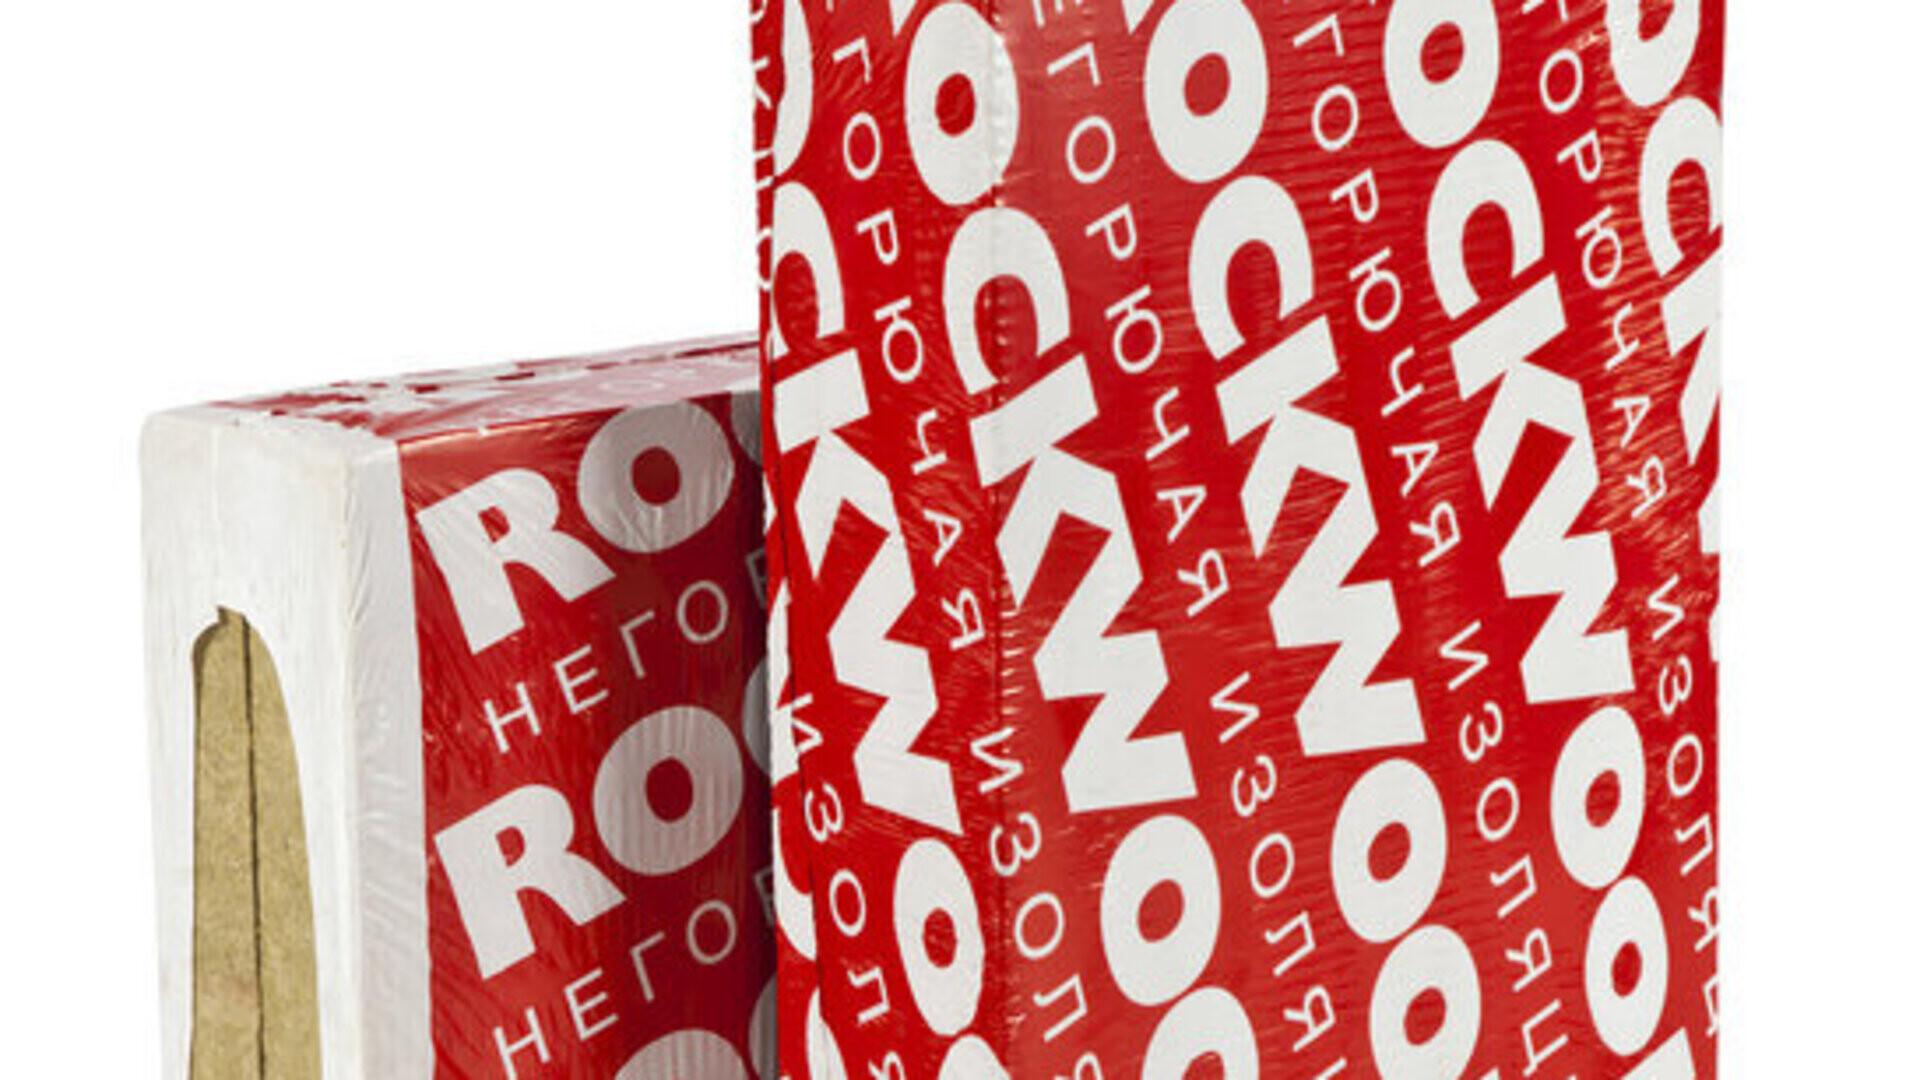 FLOOR BATTS I, package, product, slabs, HVAC, Process industry, acoustics, Floors